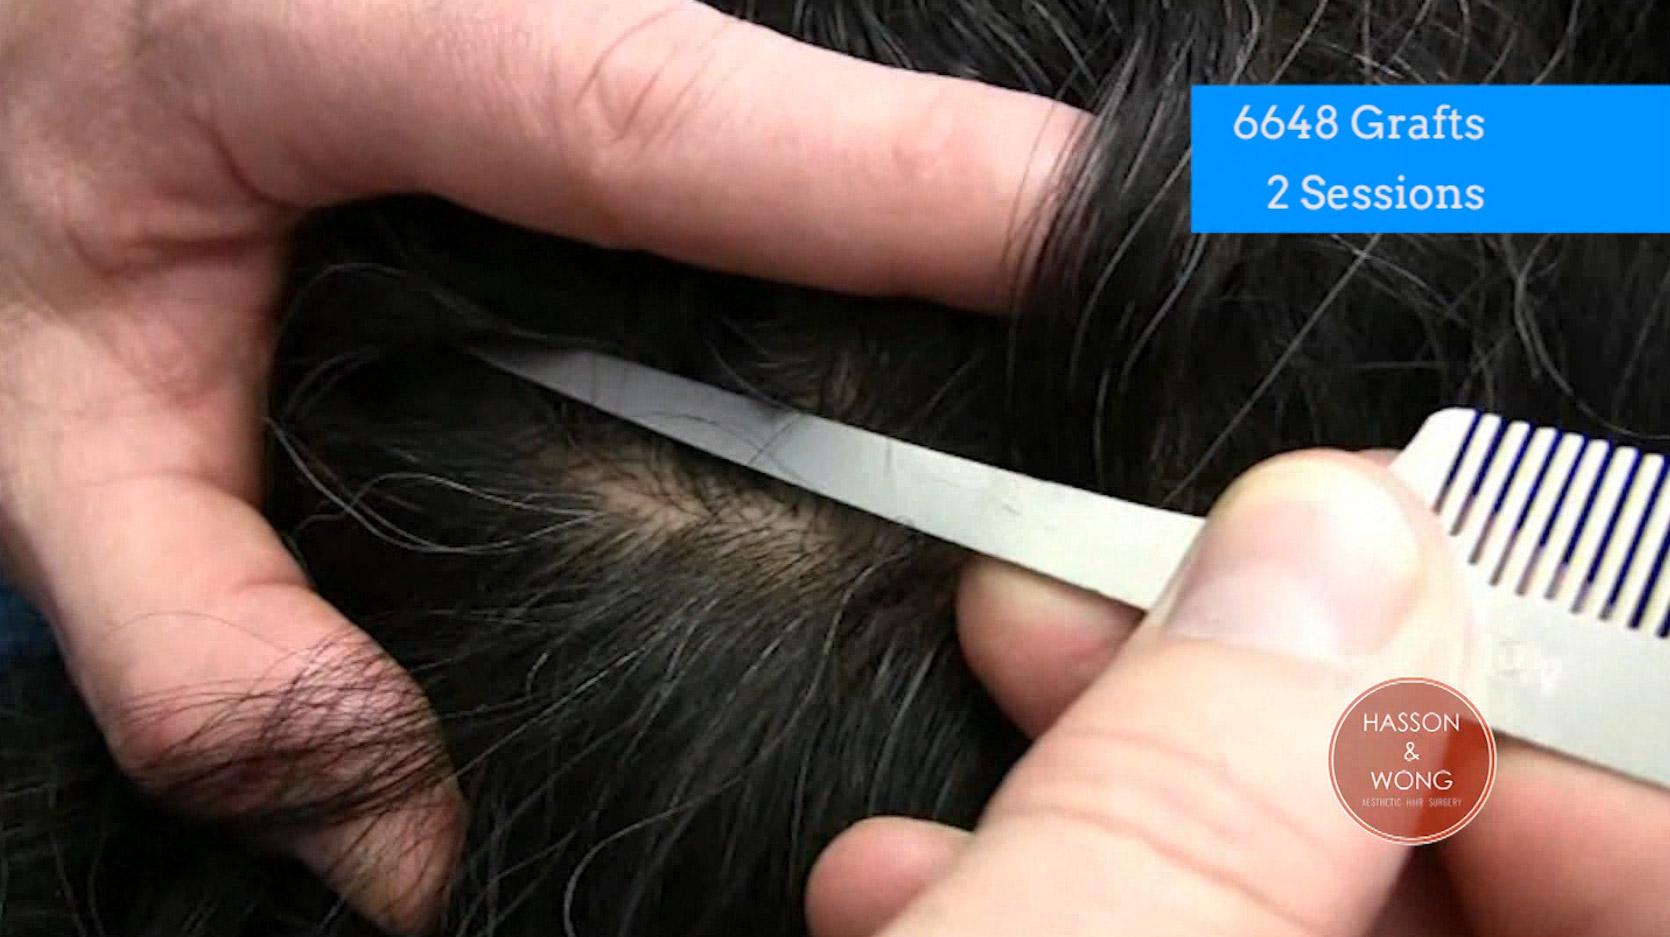 Hair transplant scar after hair transplant surgery